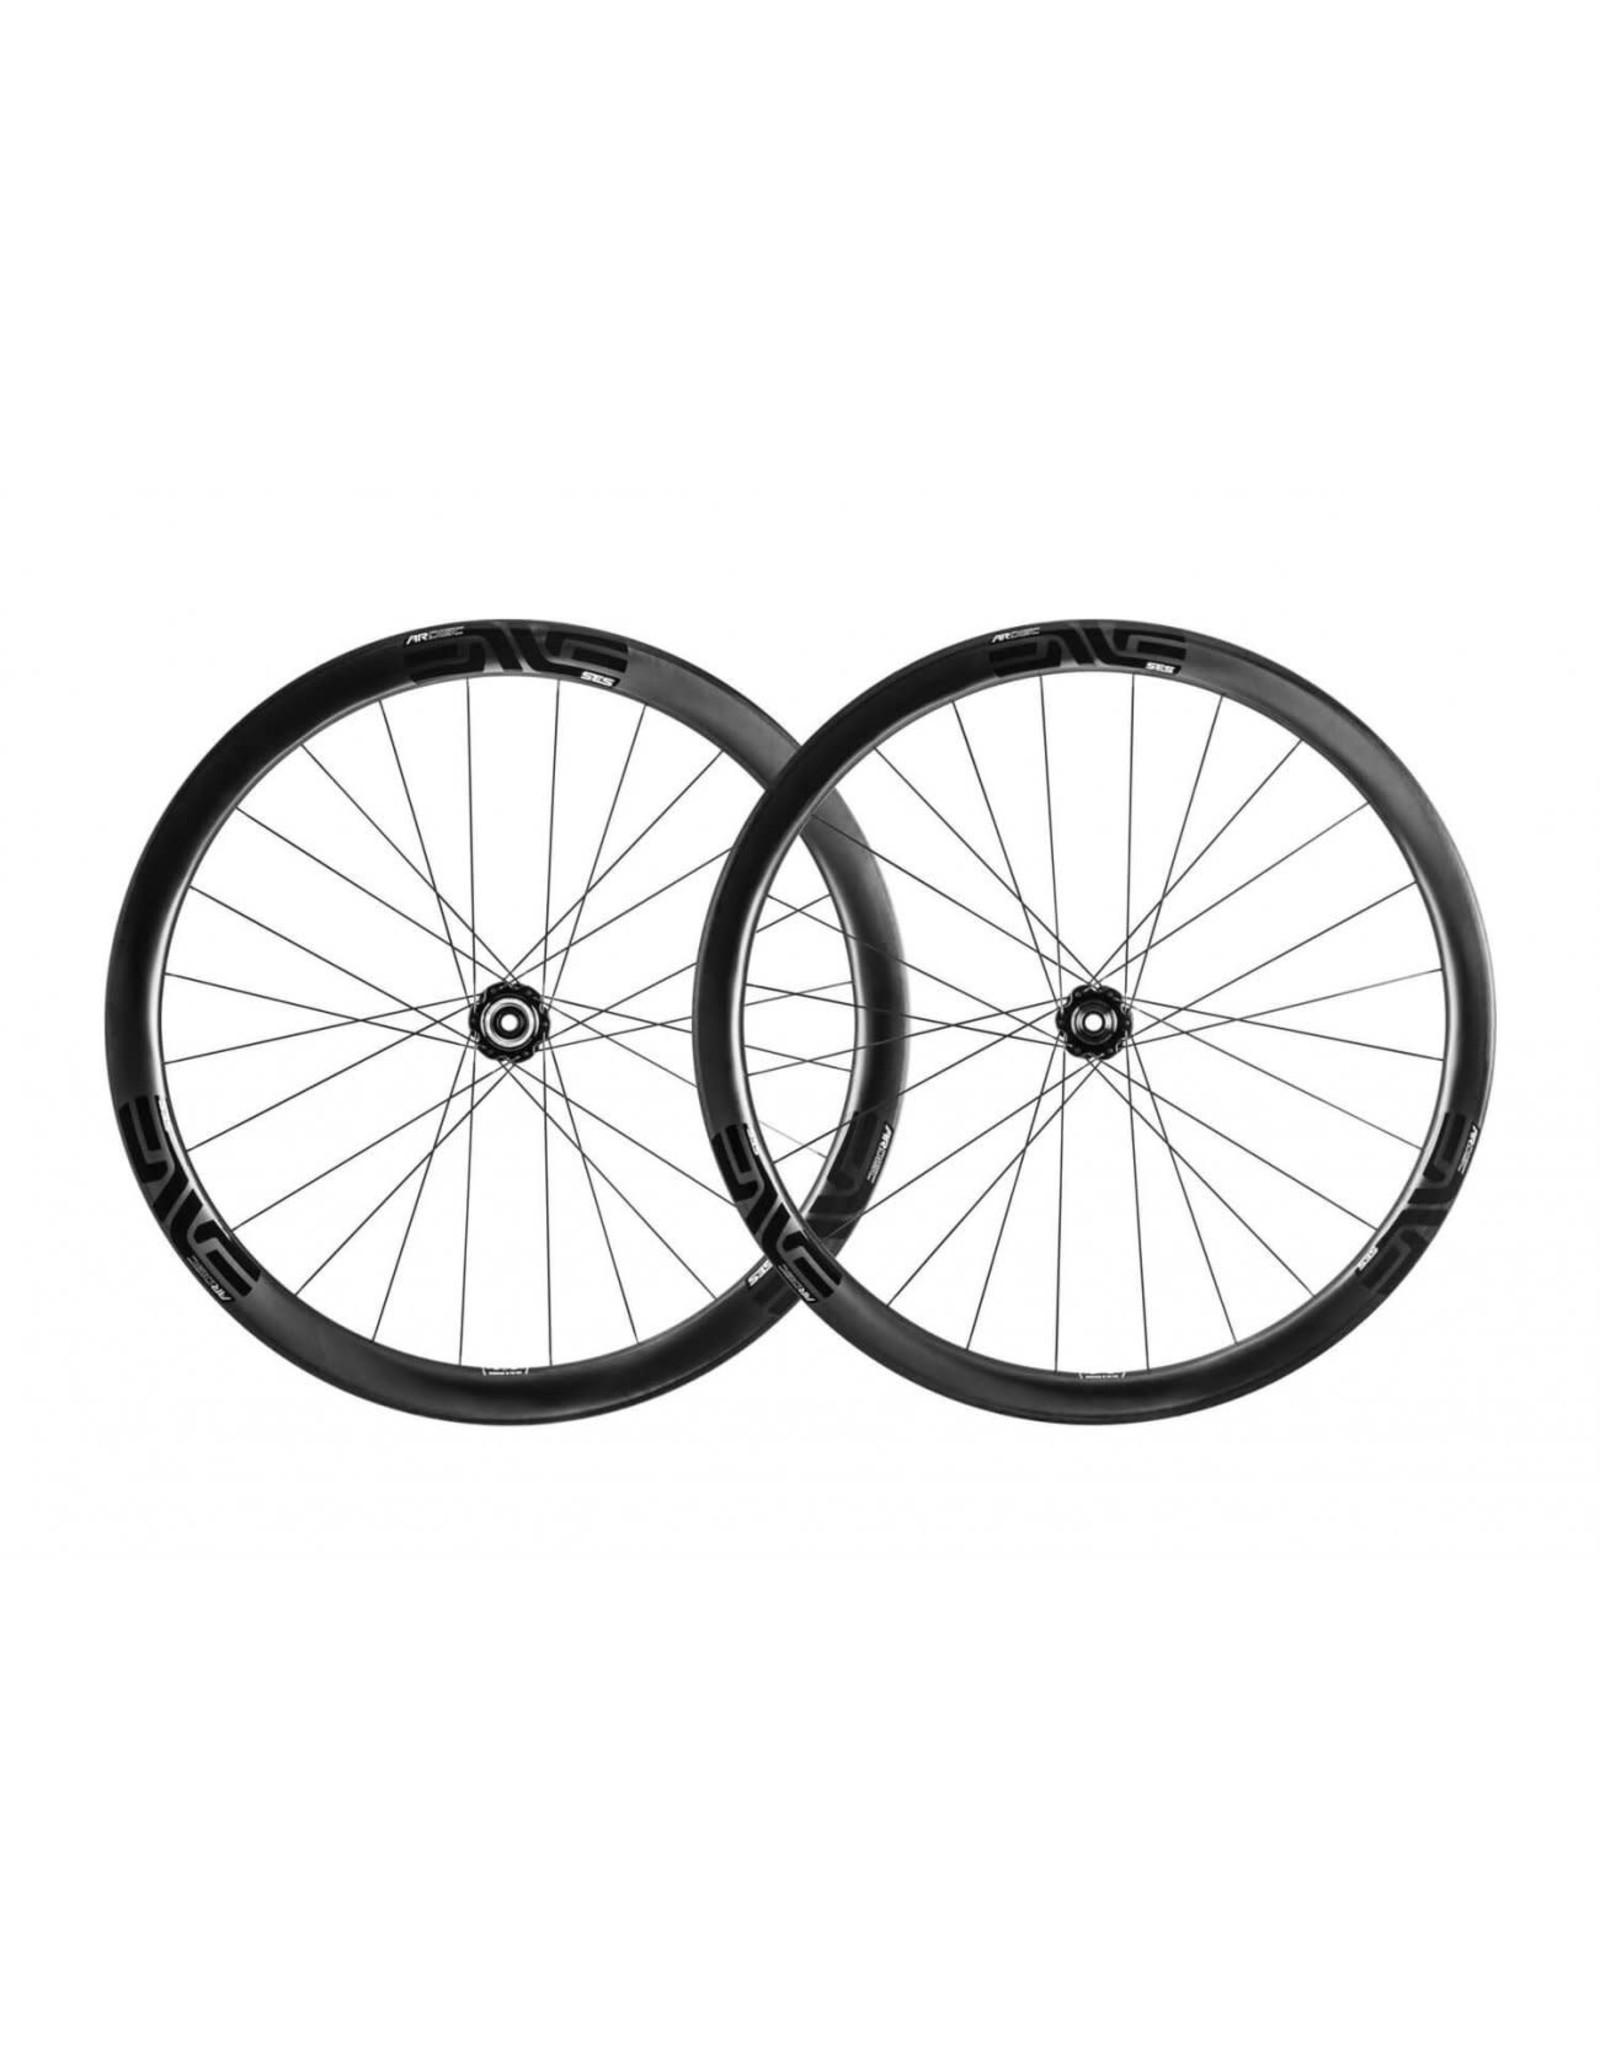 ENVE Composites ENVE SES 3.4 AR Disc Wheelset - Chris King (Shimano/SRAM)